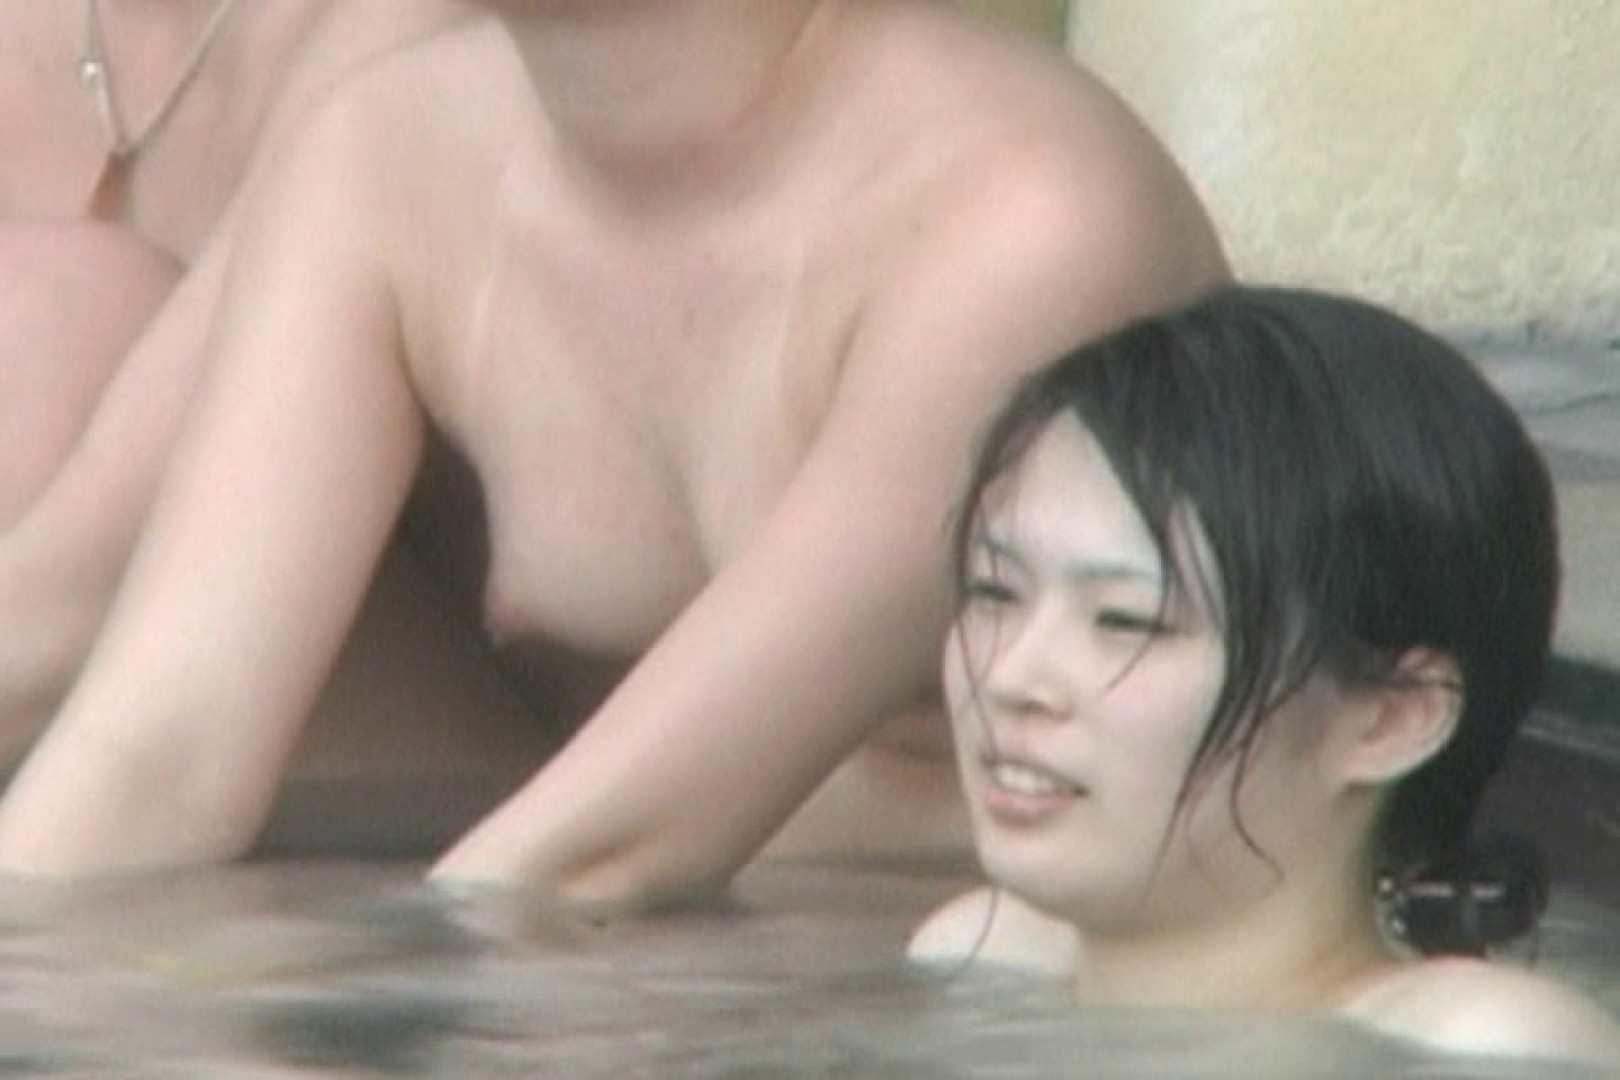 Aquaな露天風呂Vol.593 美しいOLの裸体 | 露天風呂突入  83pic 58